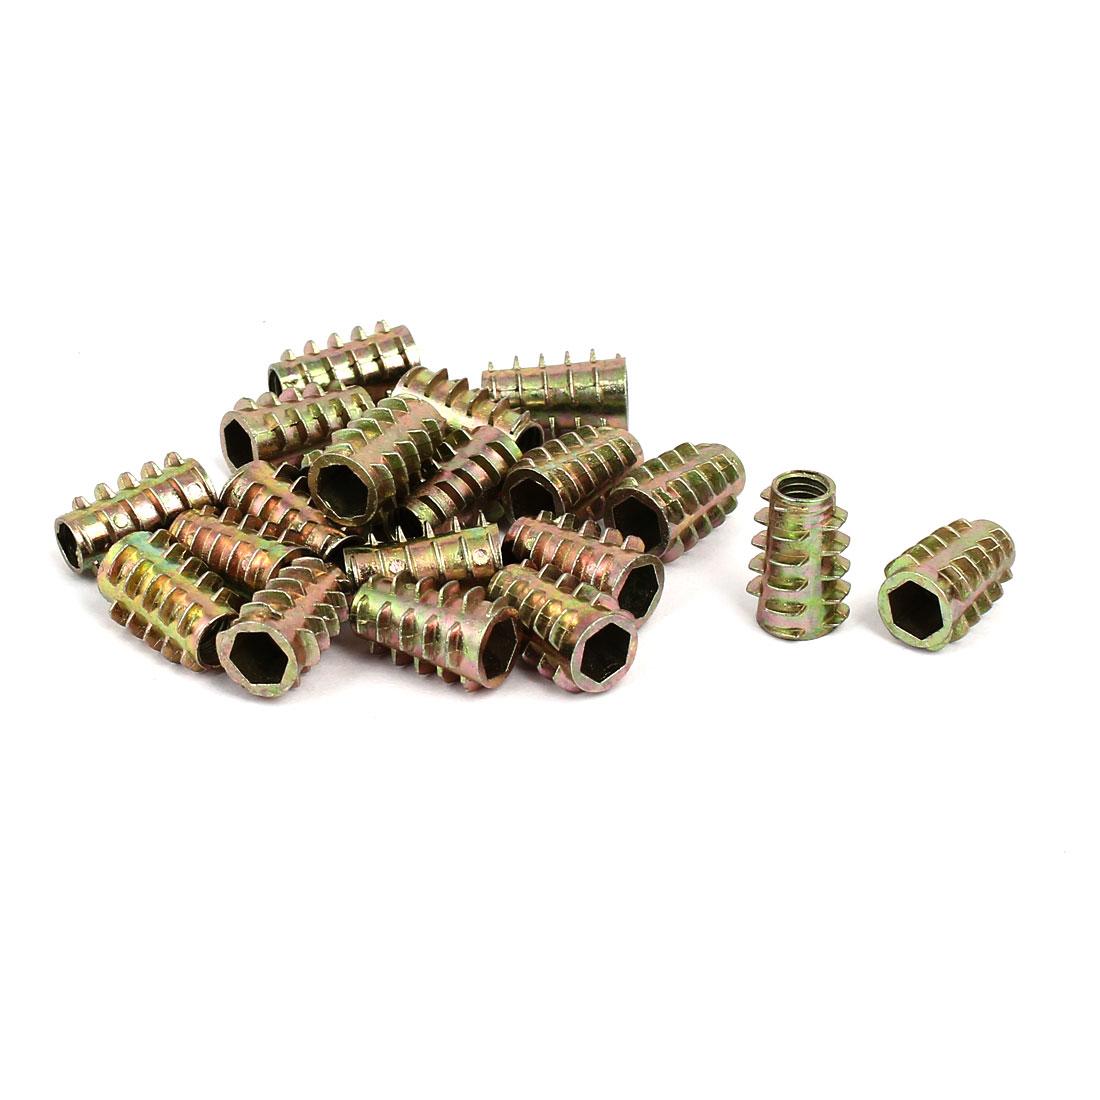 M6x18mm Hex Socket Threaded Insert Nuts Bronze Tone 20pcs for Wood Furniture